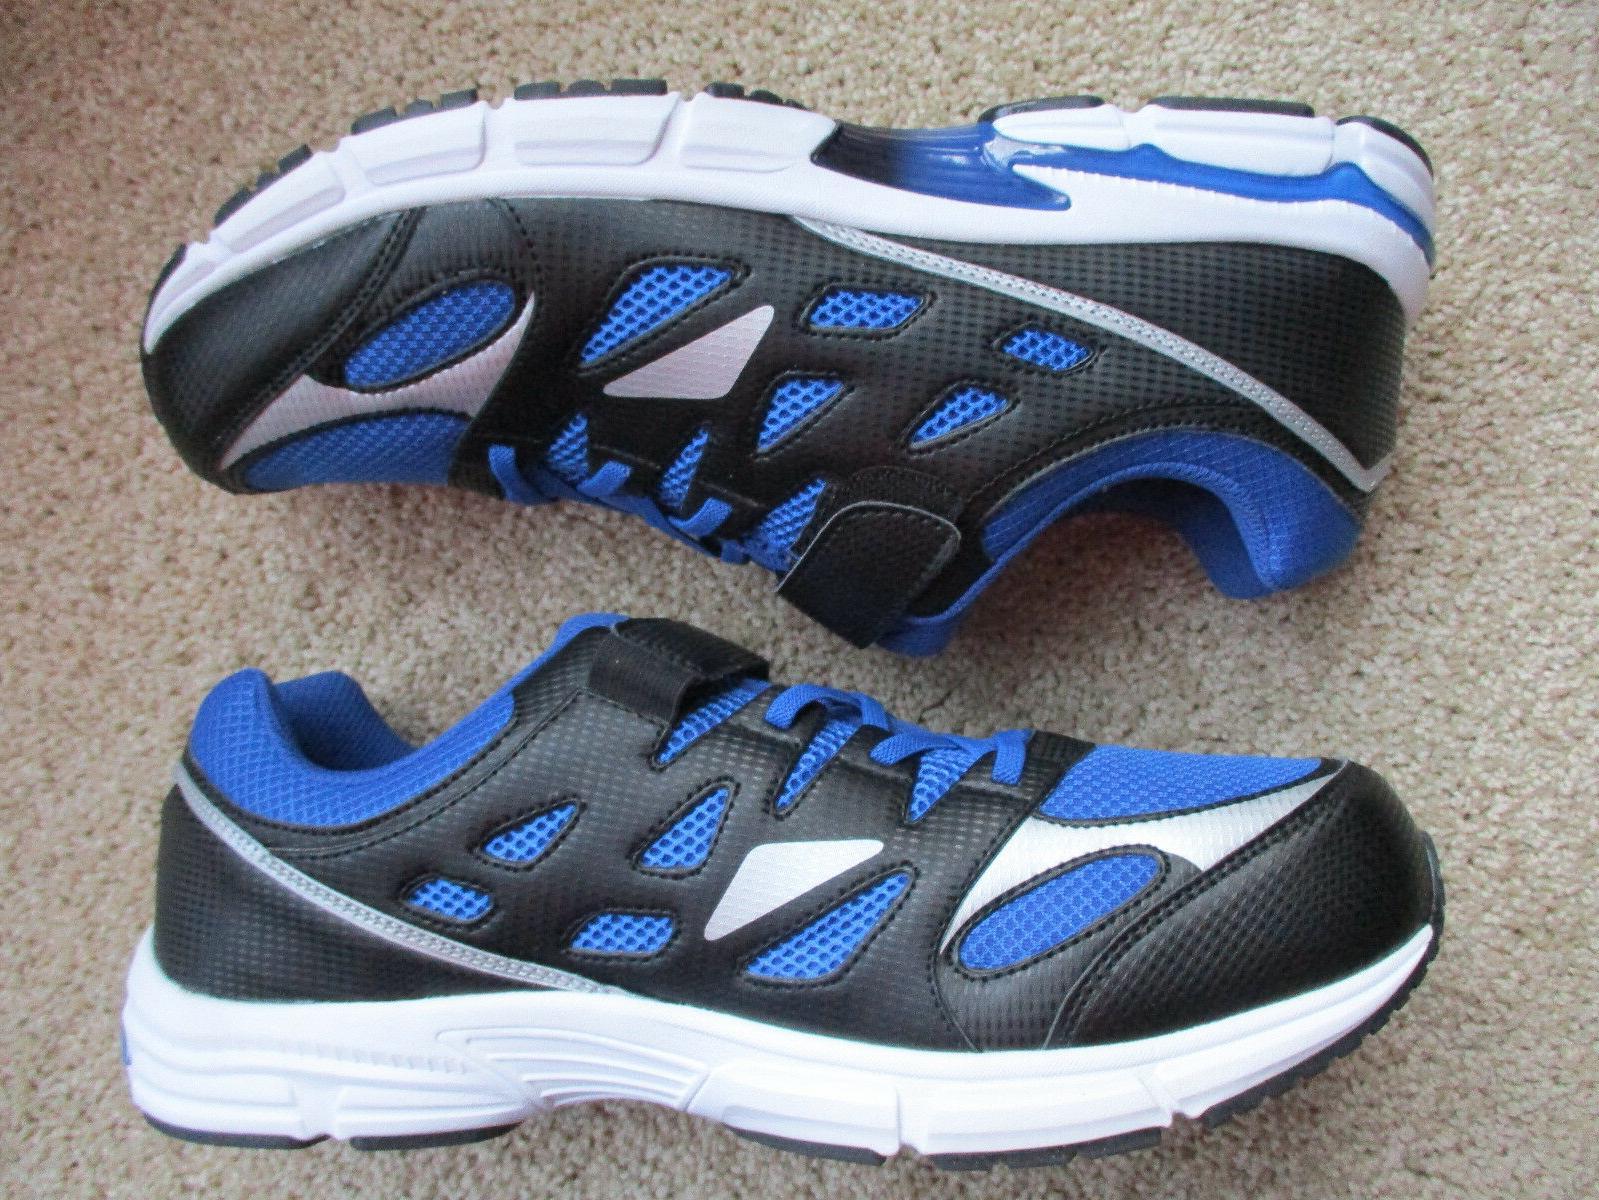 Brand New Men's tennis shoes #10797